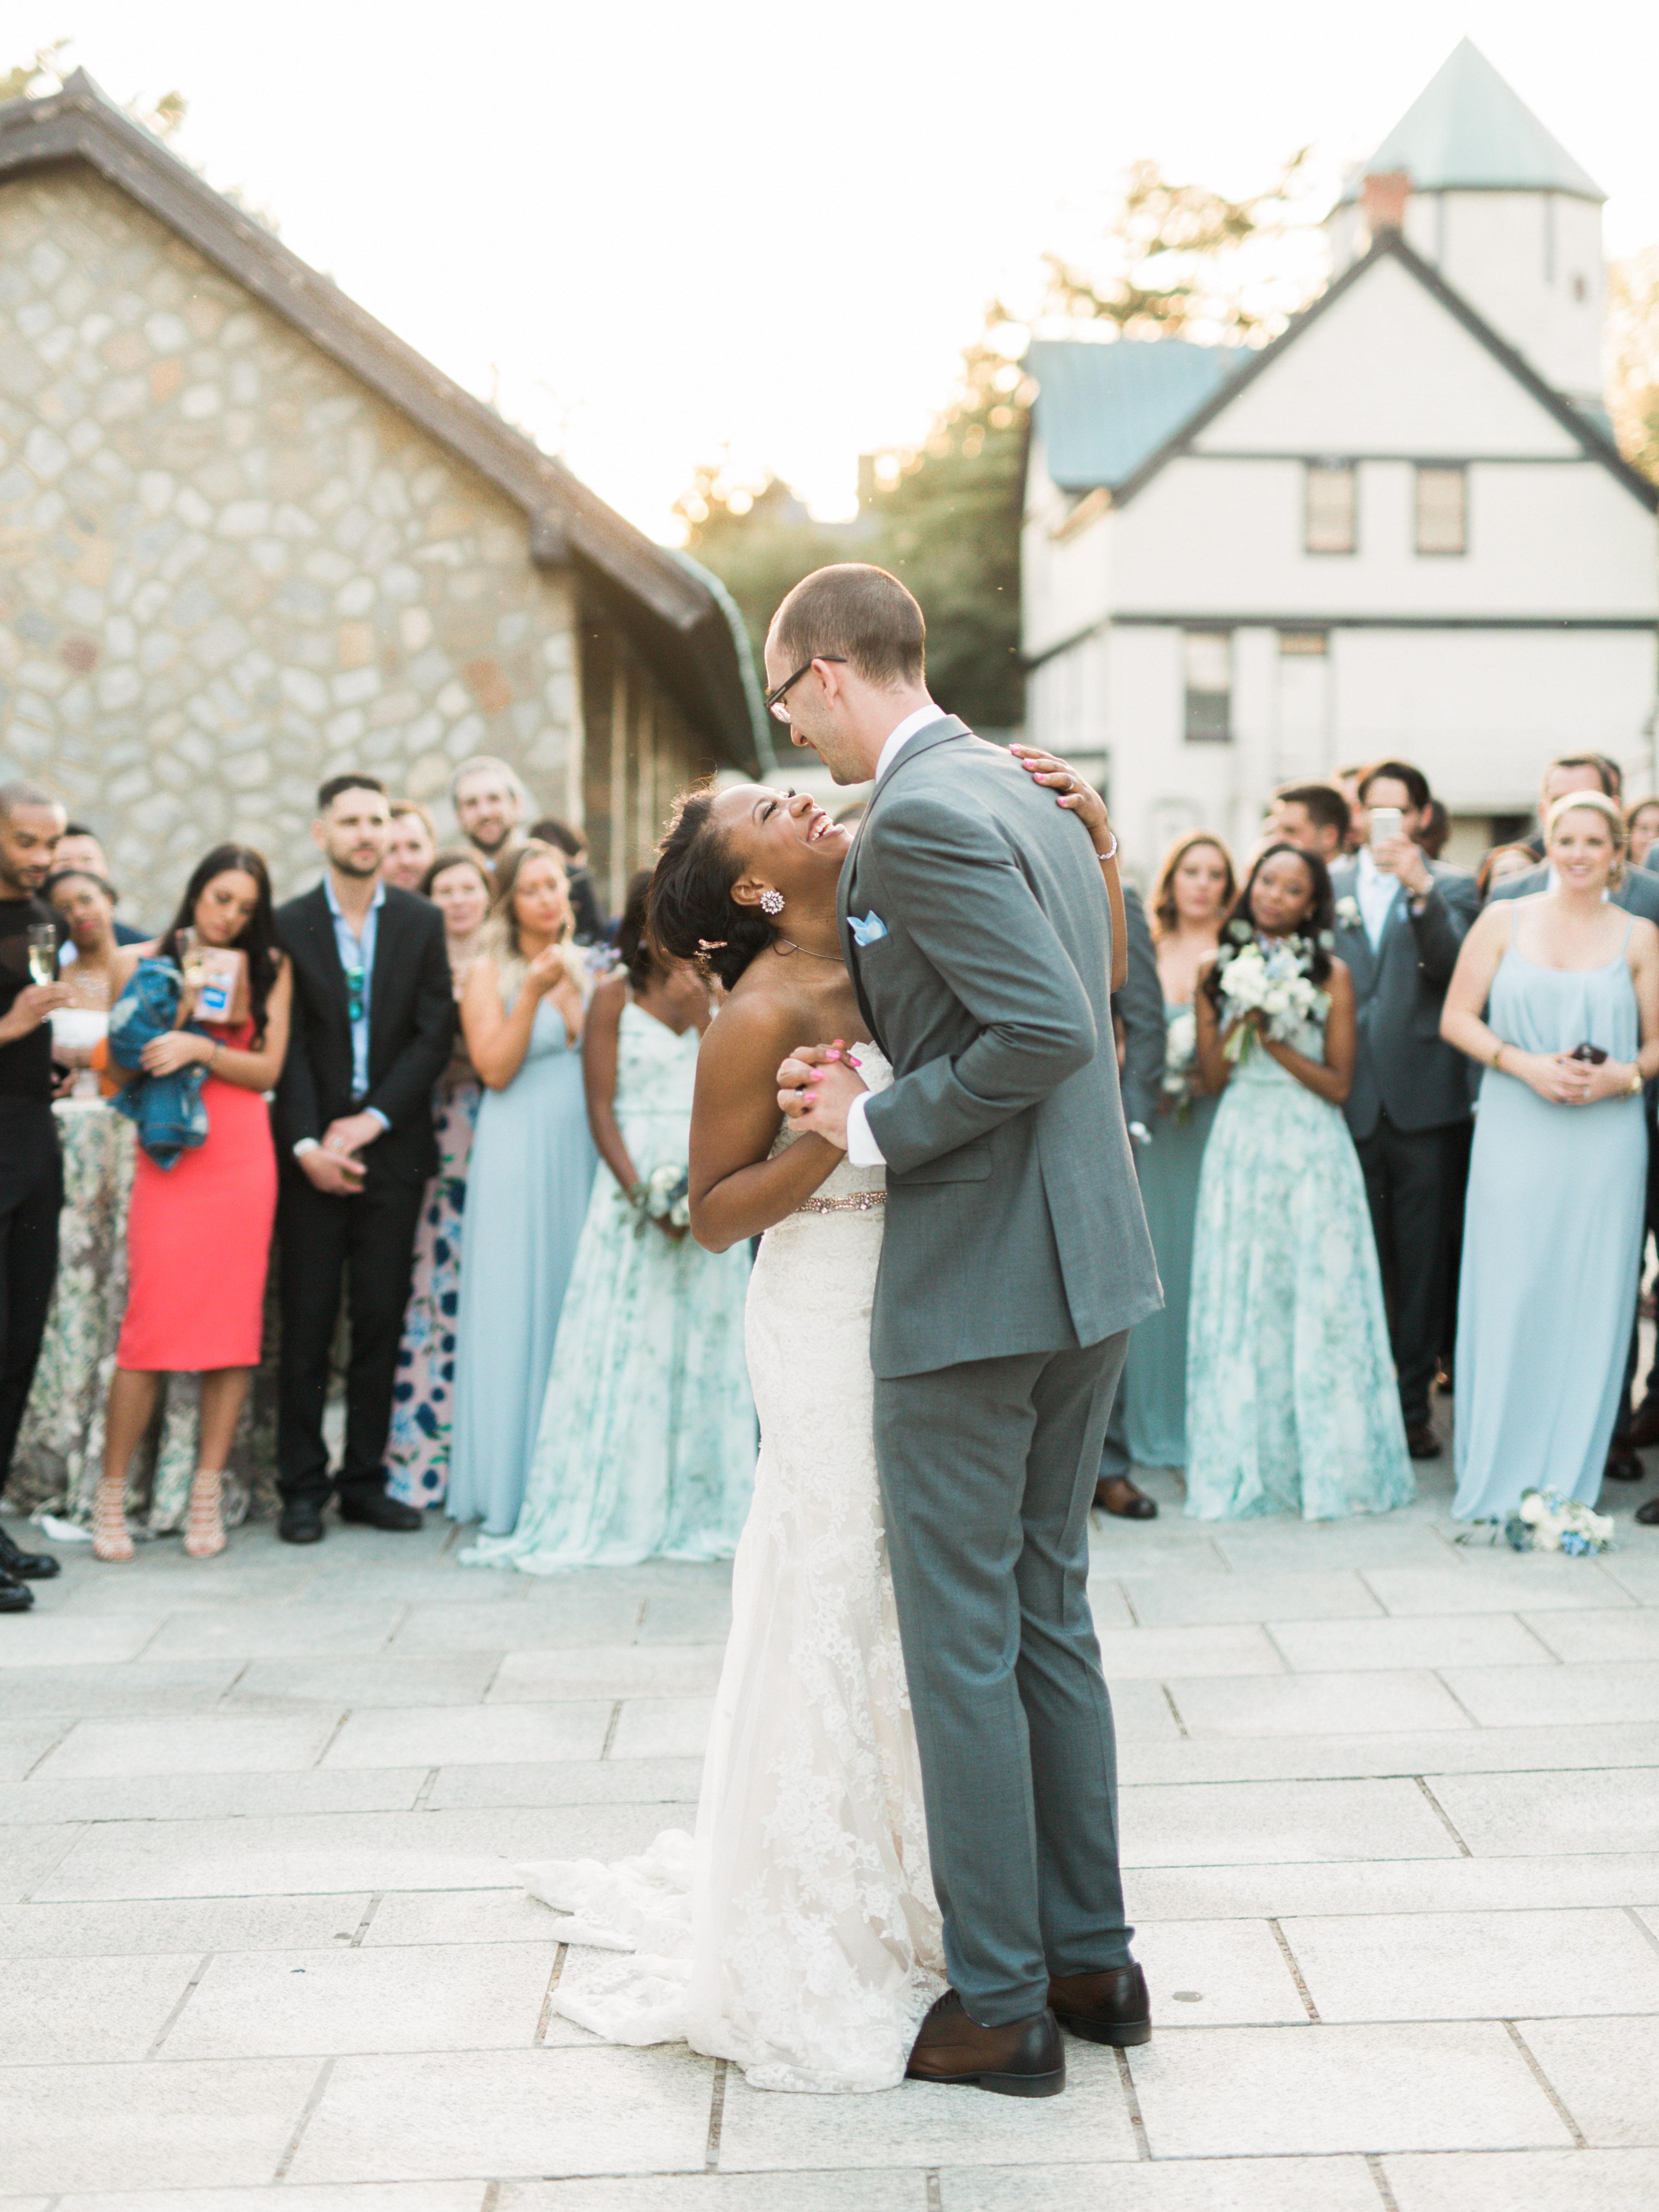 outdoor wedding reception bride groom first dance